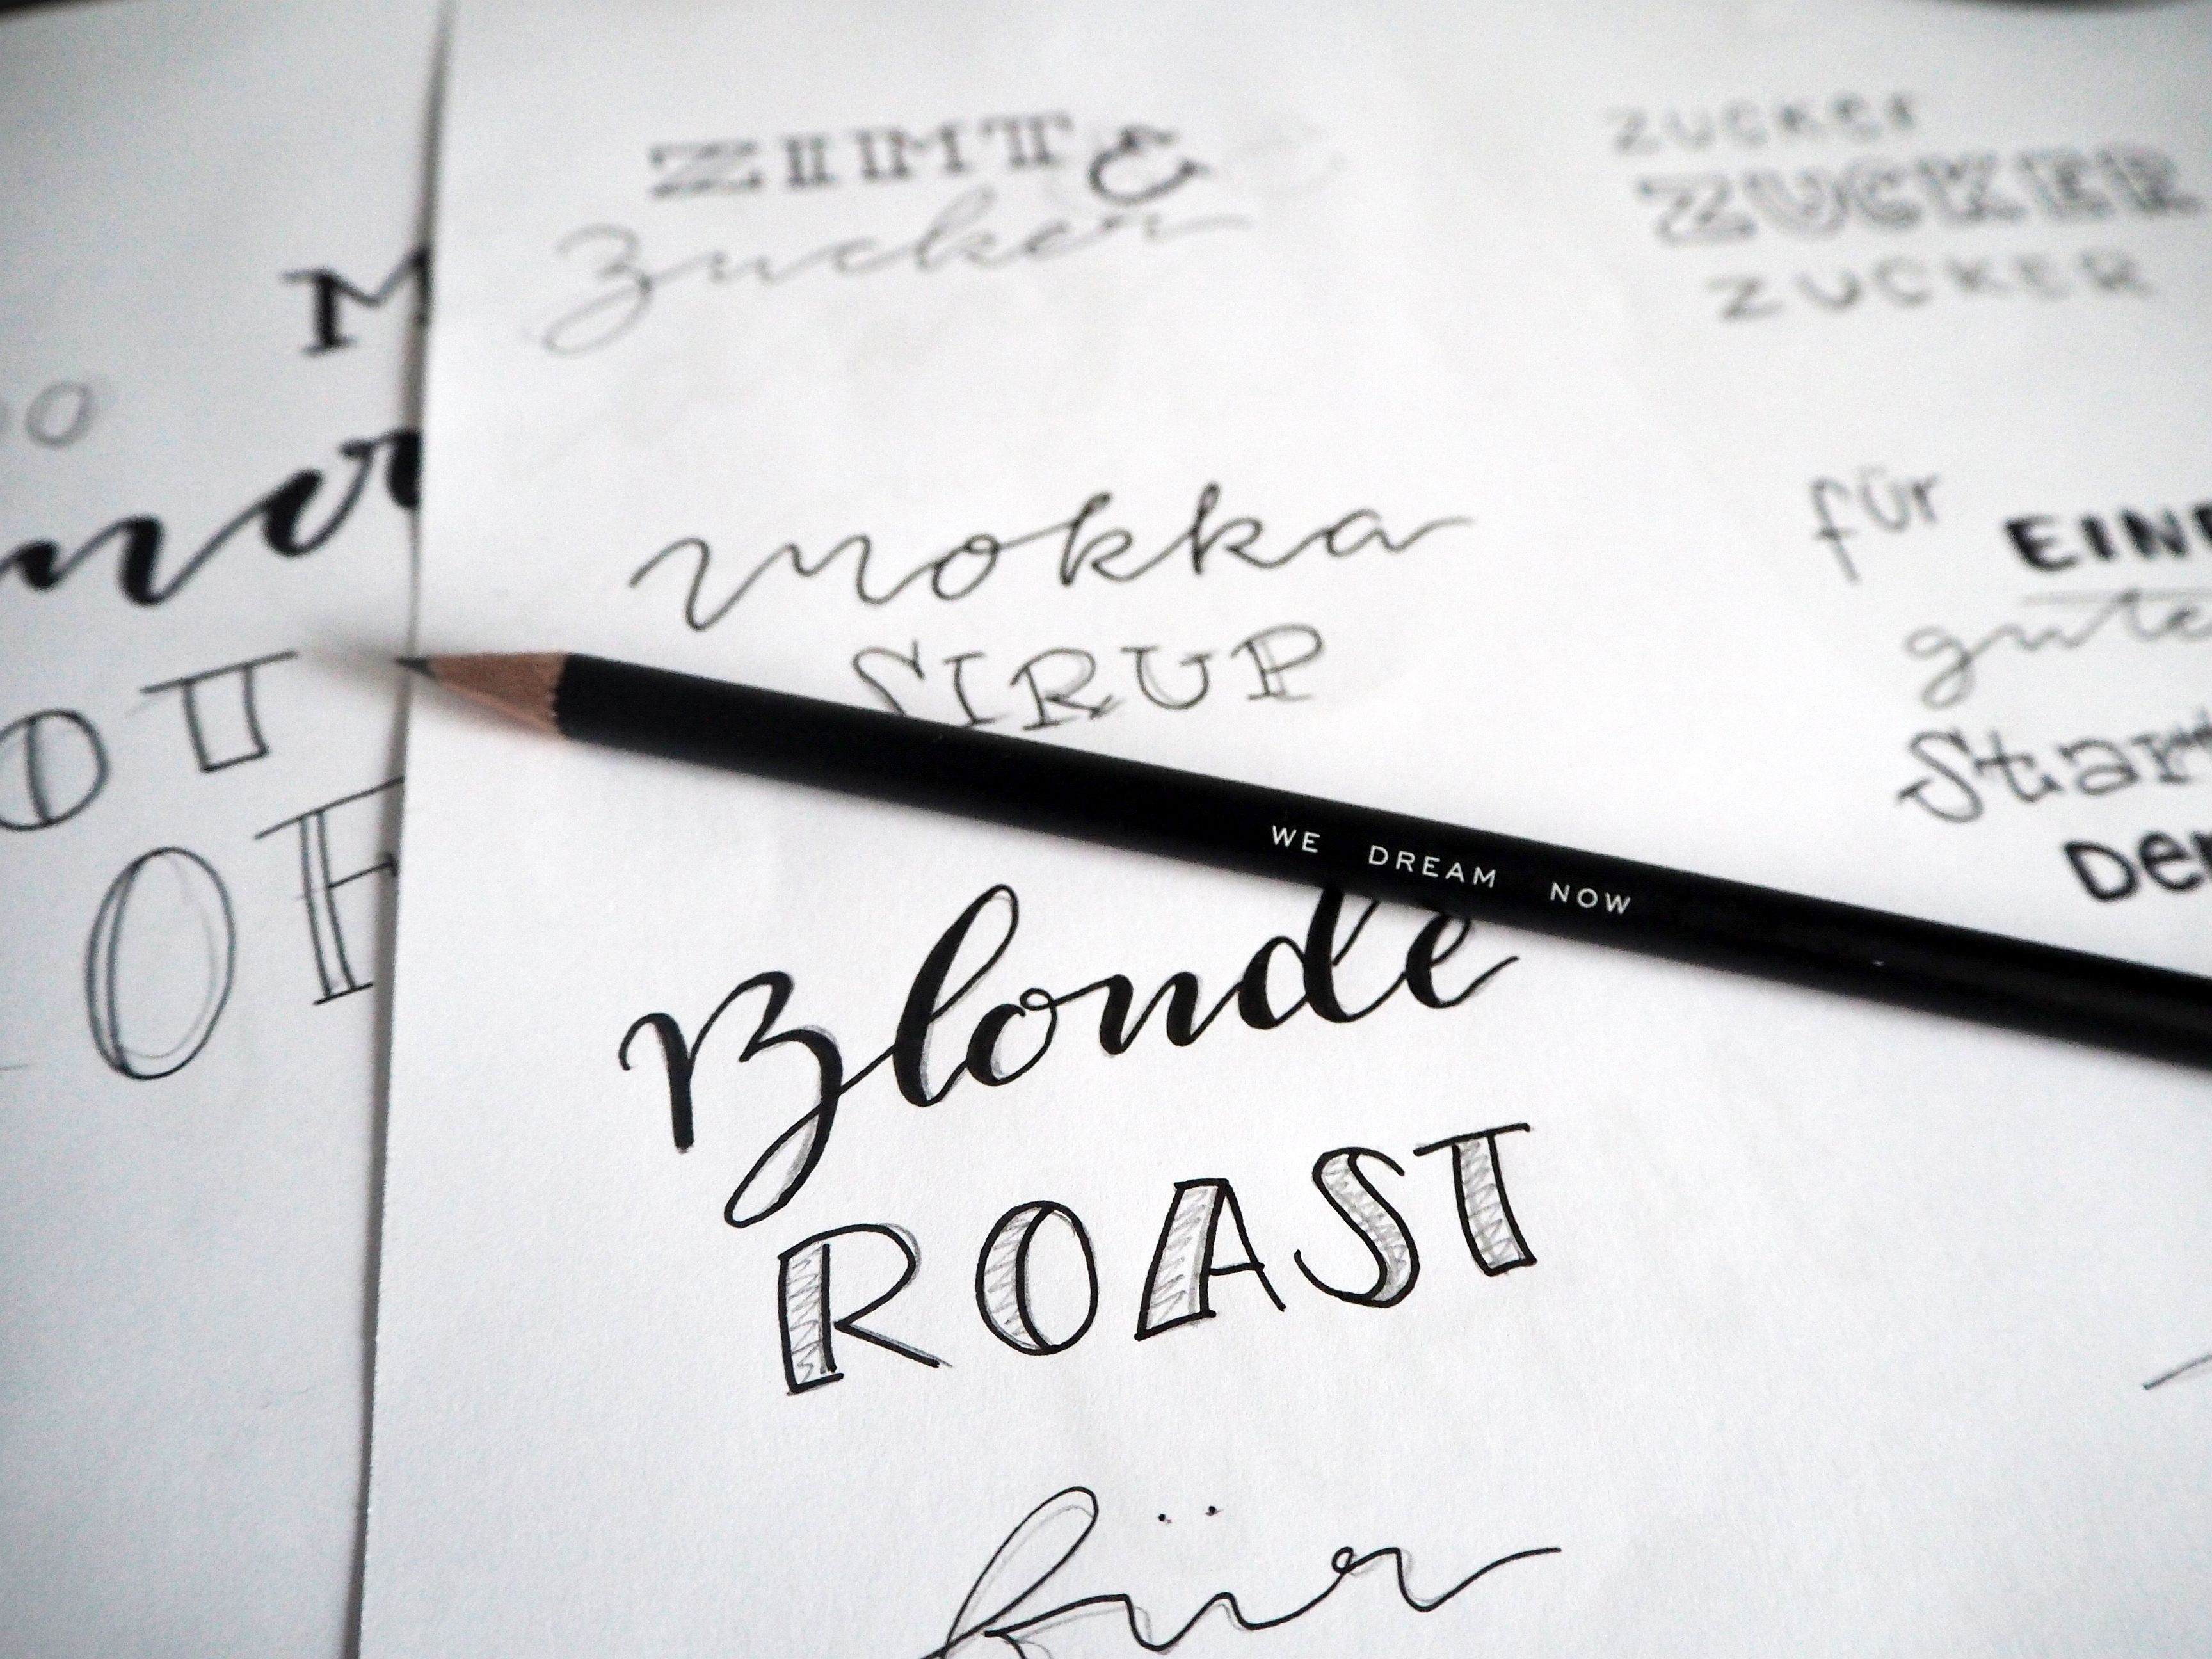 2018-05-skoen-och-kreativ-diy-lettering-set-fuer-kaffee-auszeit-zum-vatertag (13)